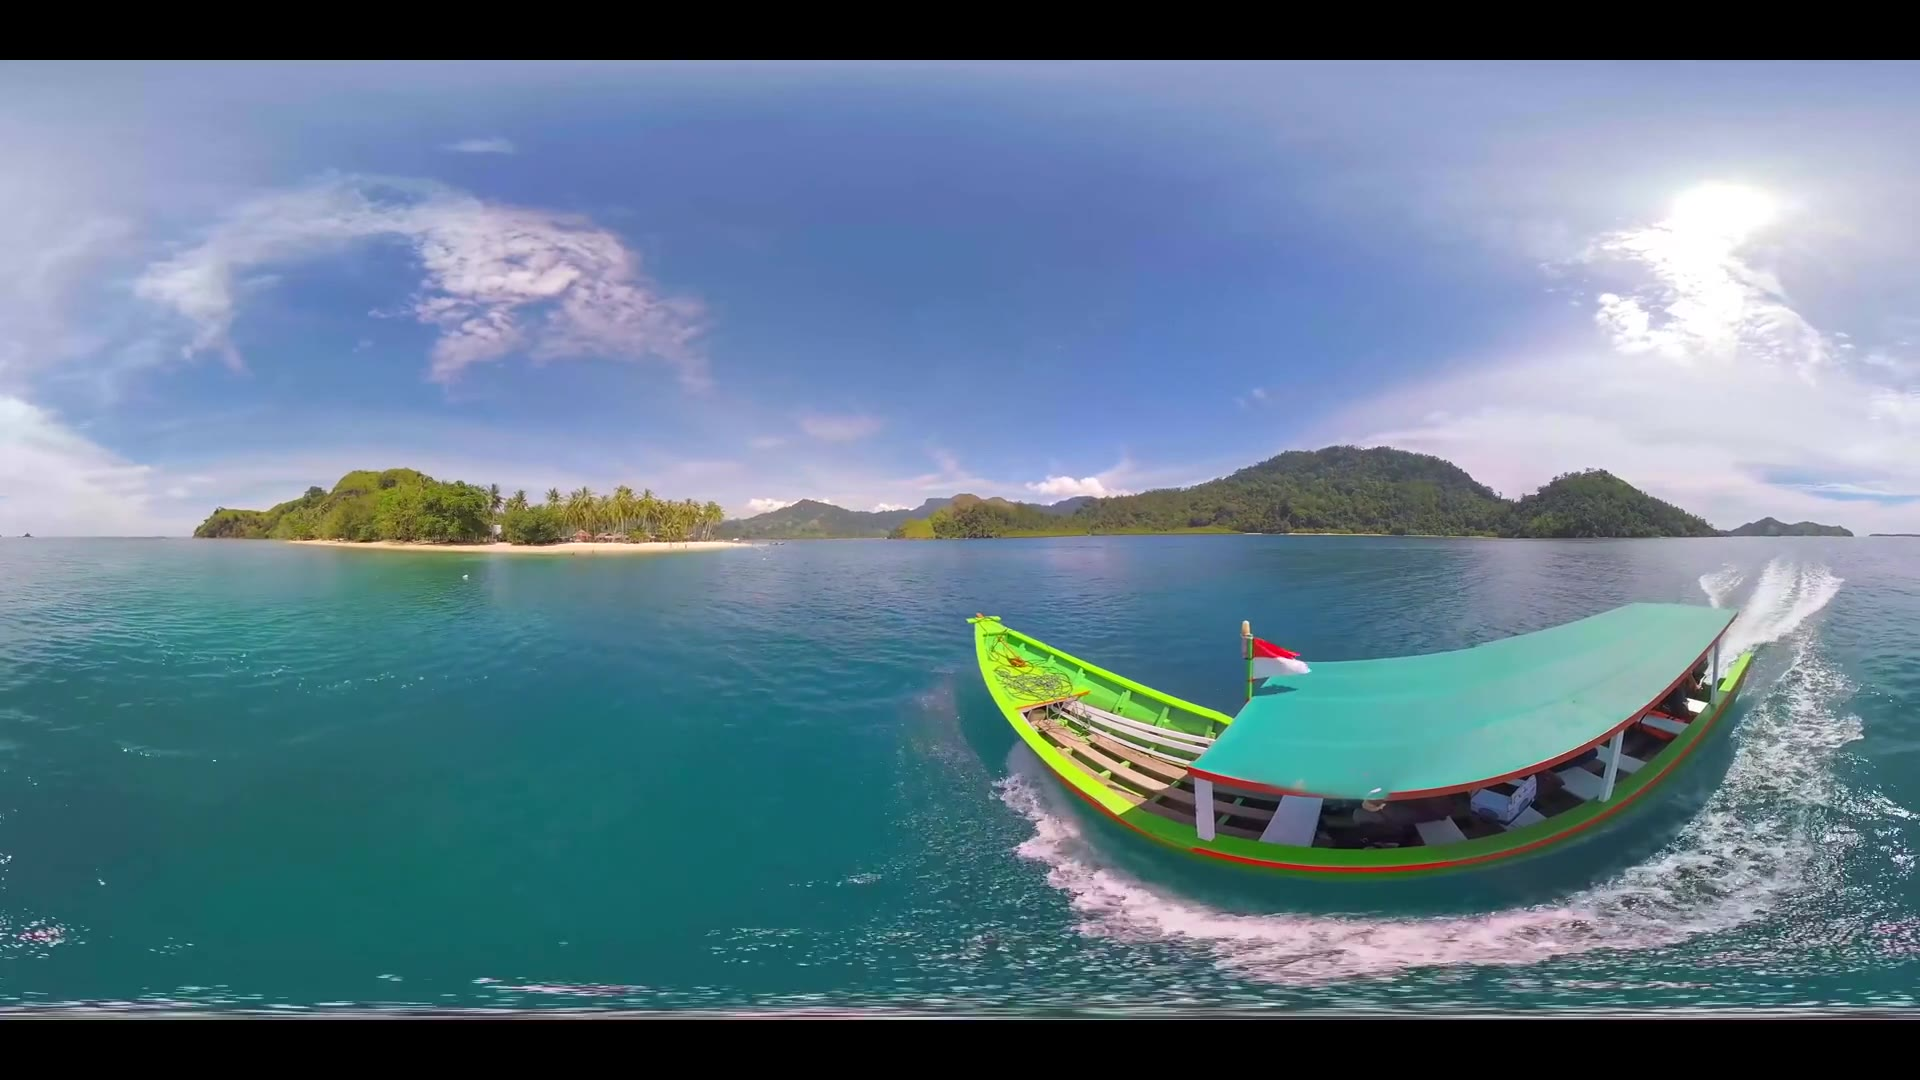 Pasumpahan Island Beach 360 VR - Multi-shot